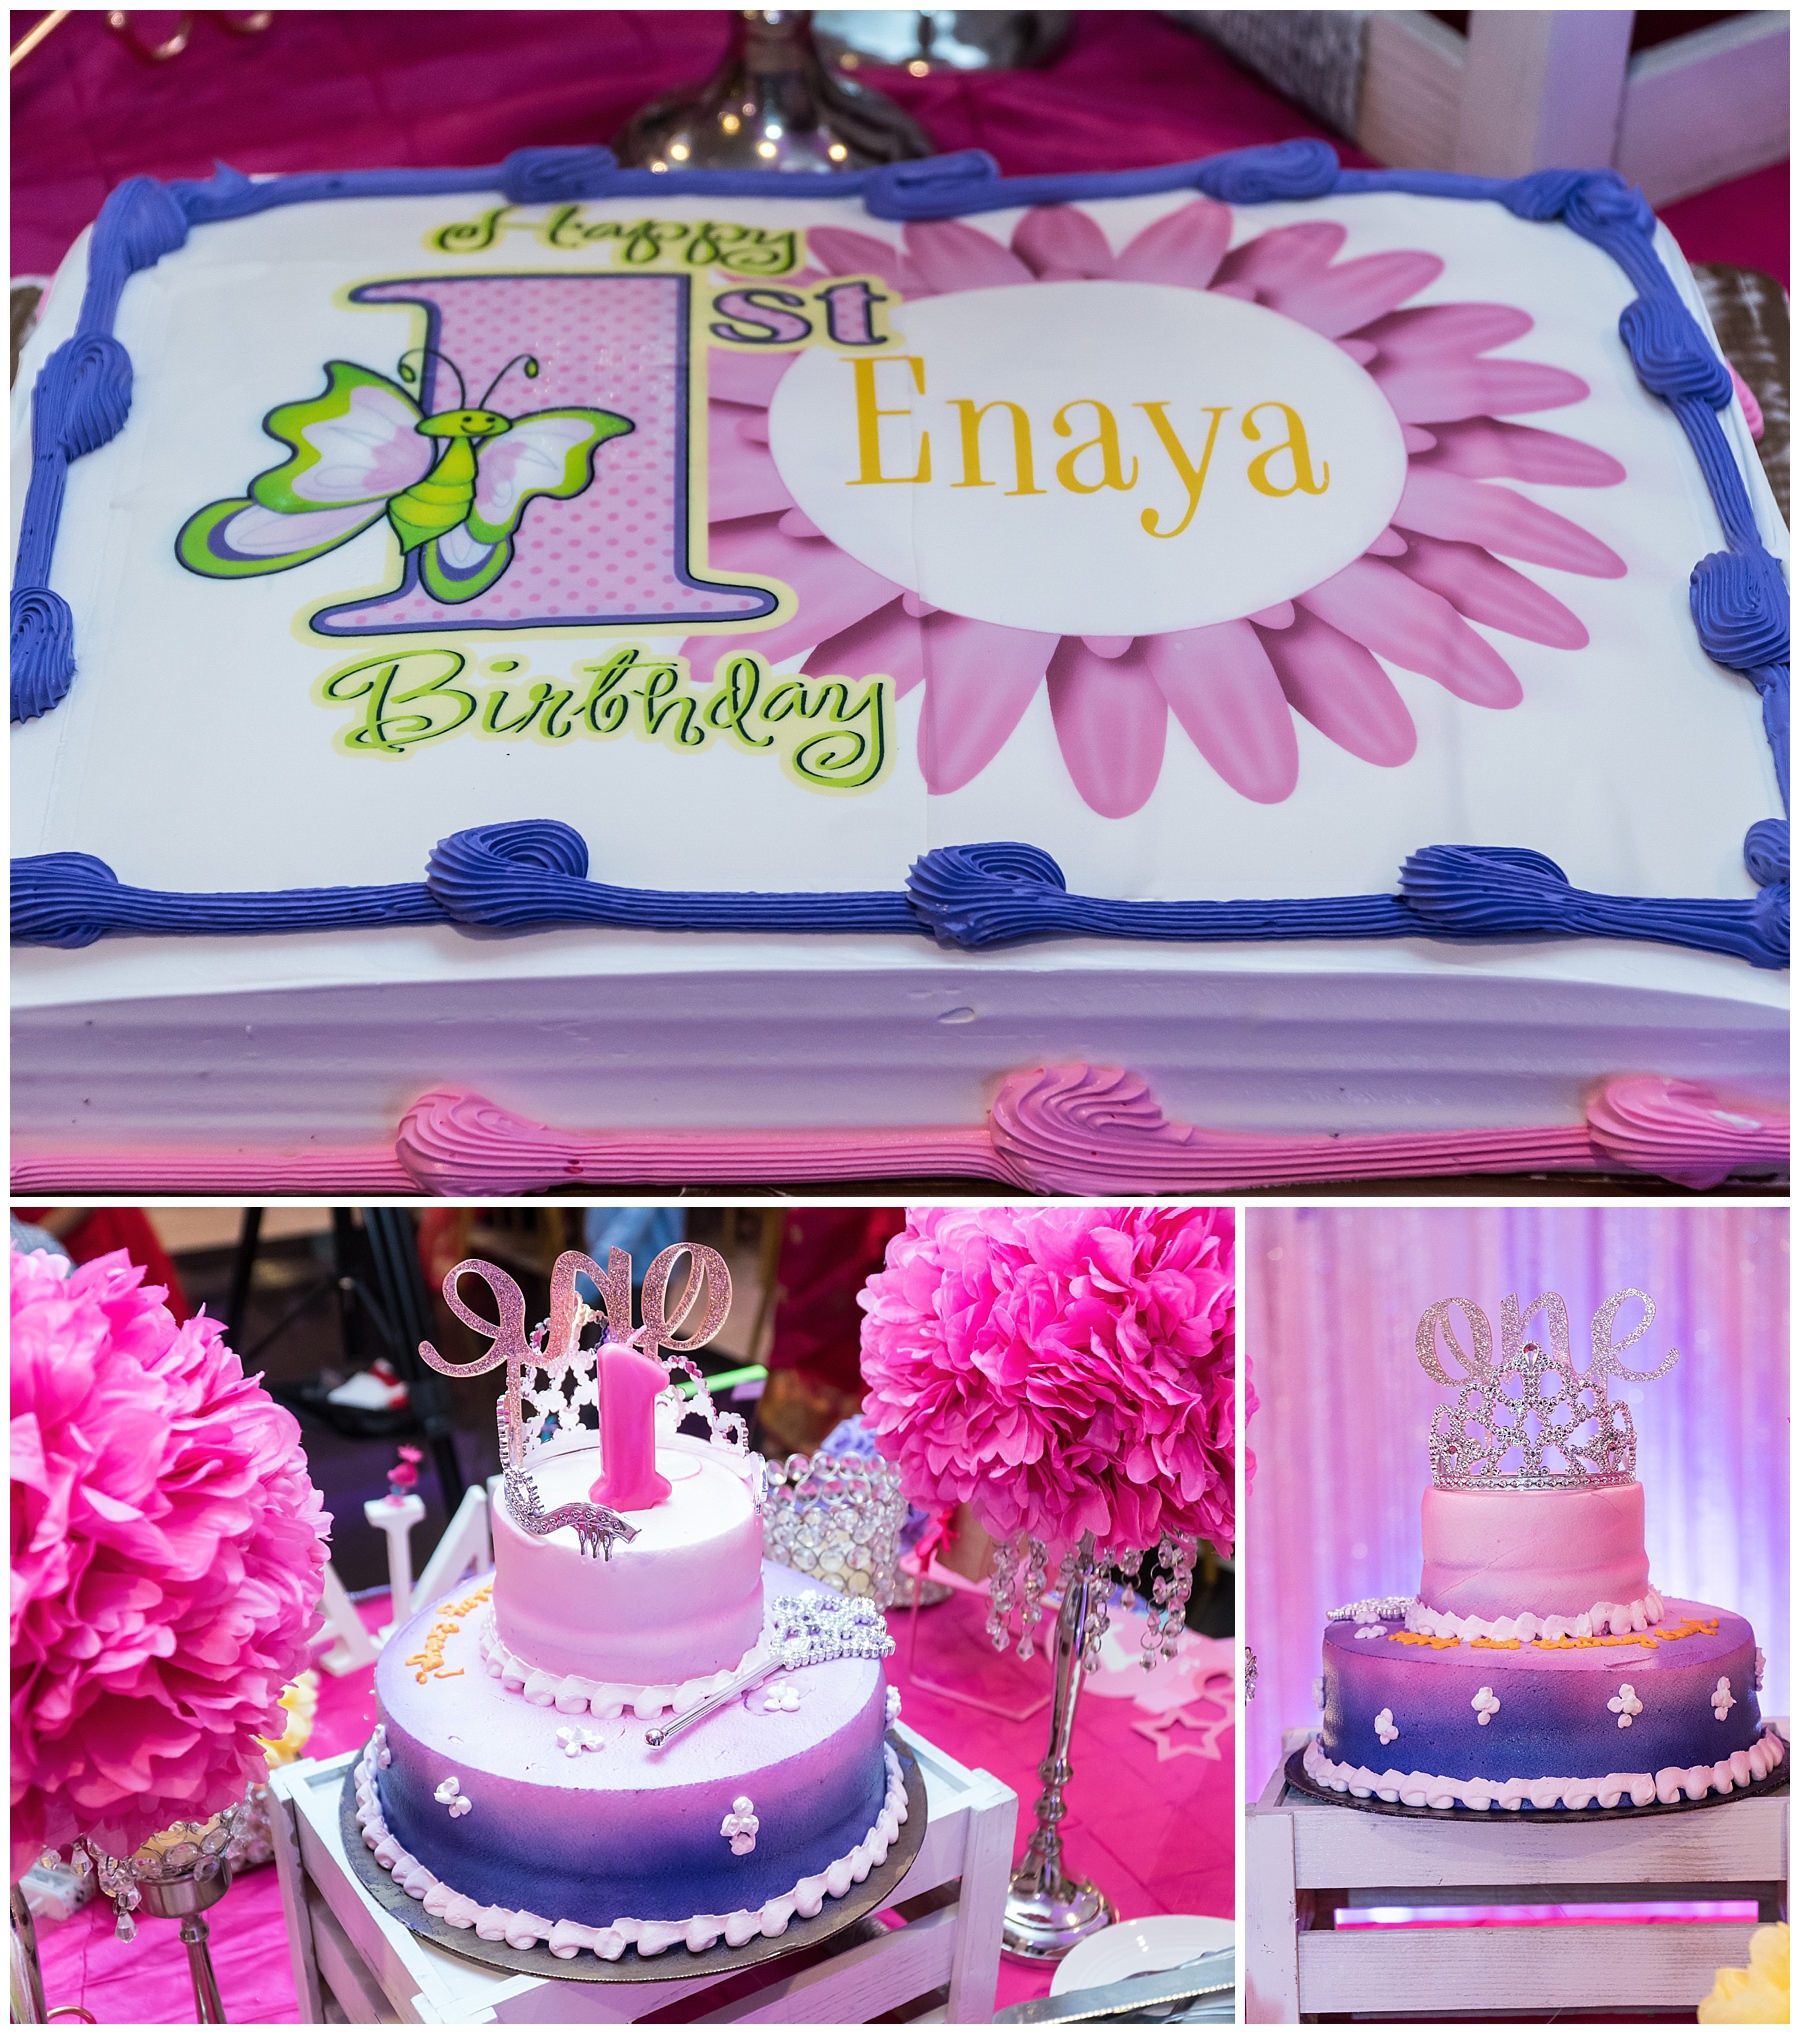 deewan-banquet-piscataway-nj-birthday-enanya-birthday-5.jpg